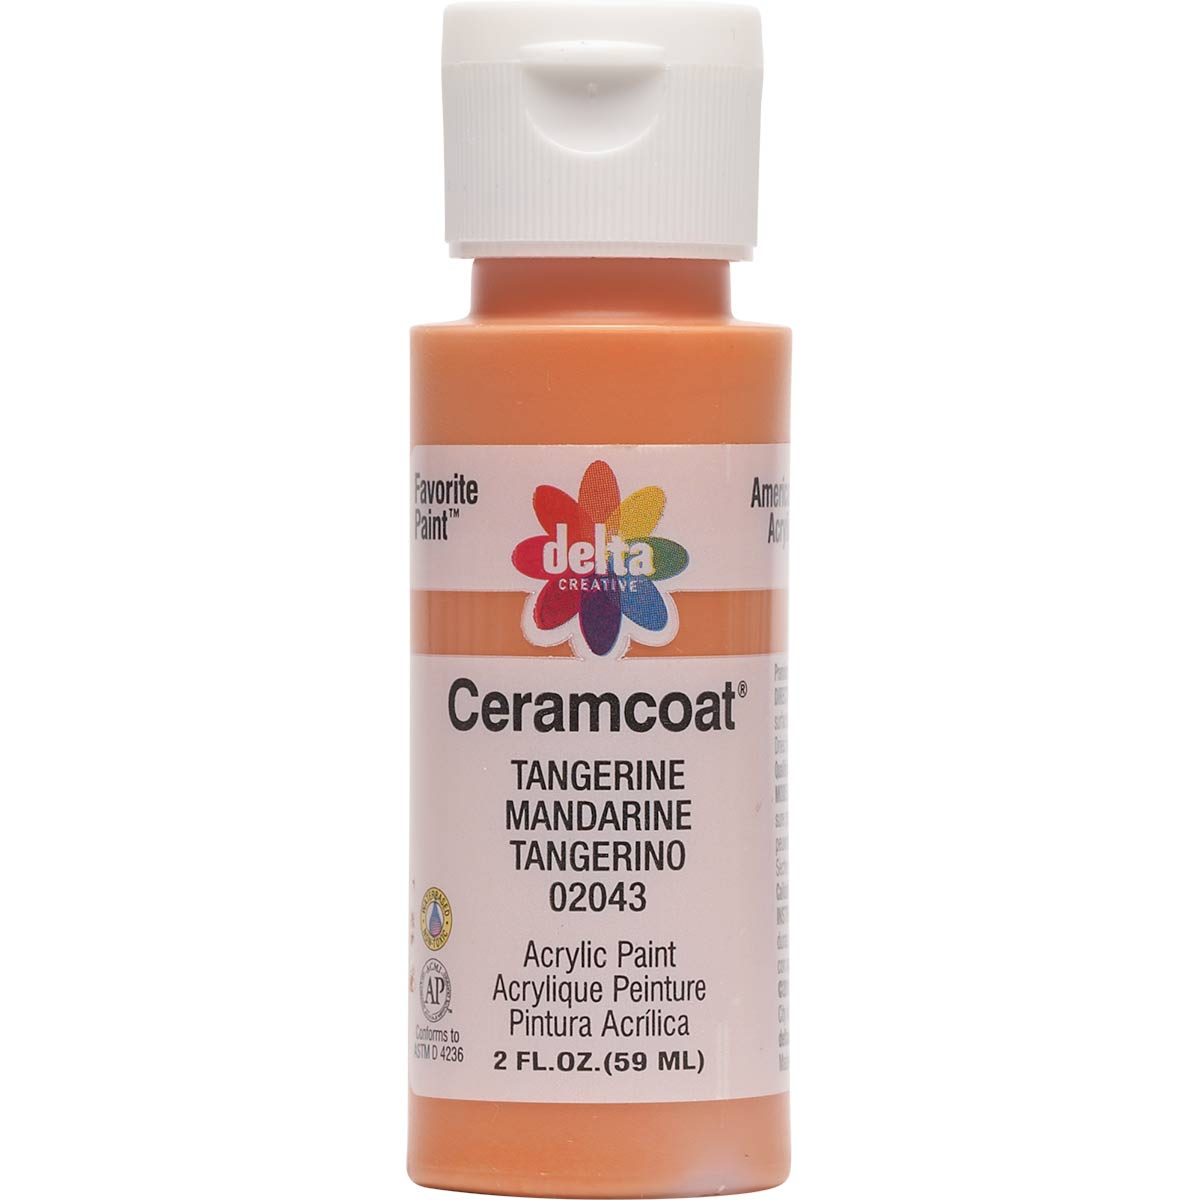 Delta Ceramcoat ® Acrylic Paint - Tangerine, 2 oz.